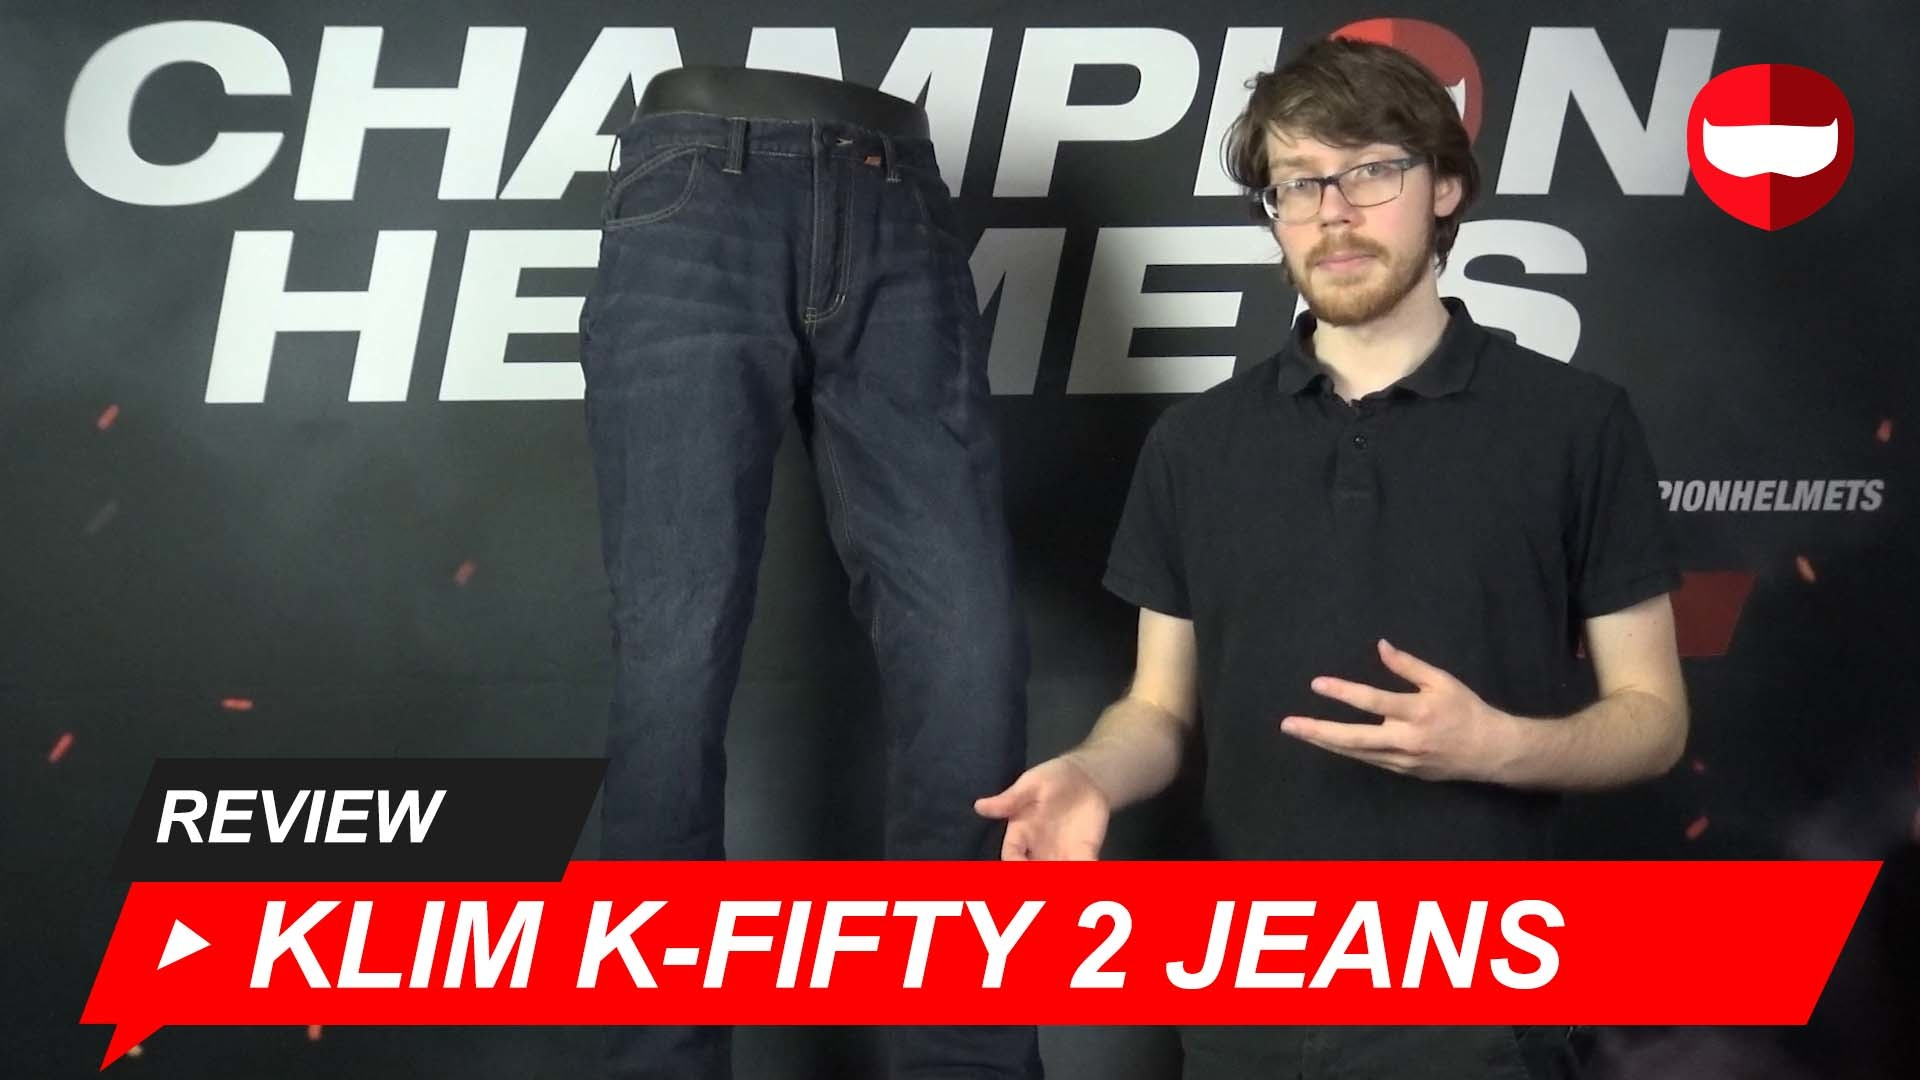 Klim K-Fifty 2 Jeans Review + Video